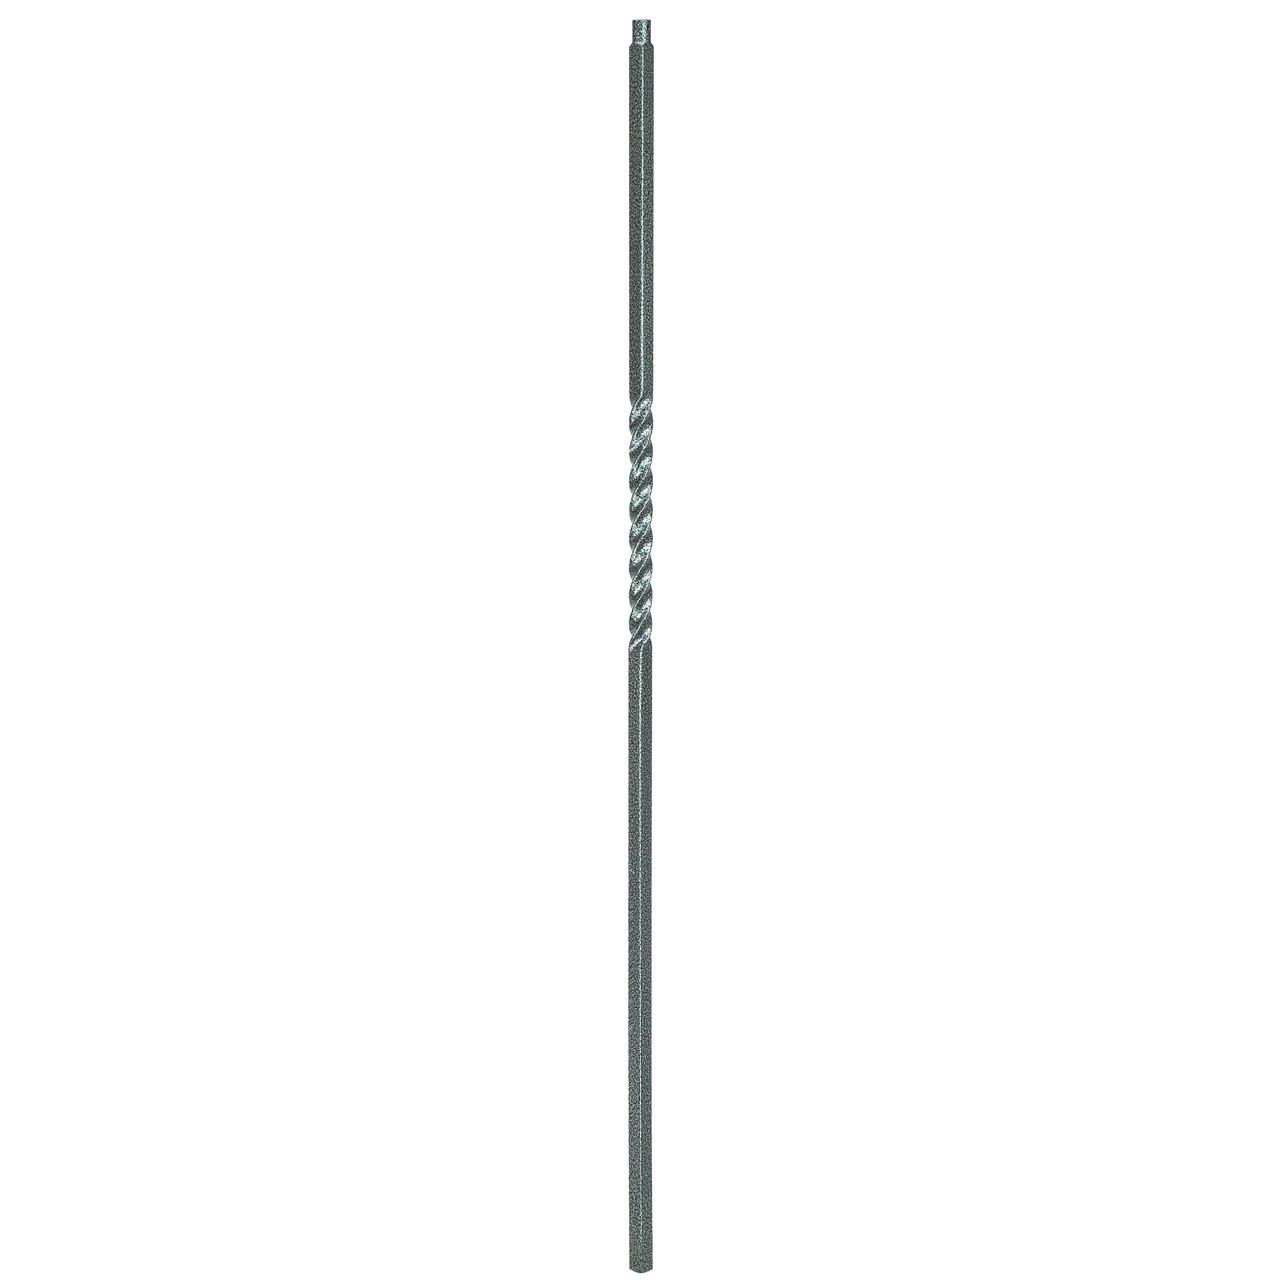 2G02 16mm Single Twist, Tubular Steel